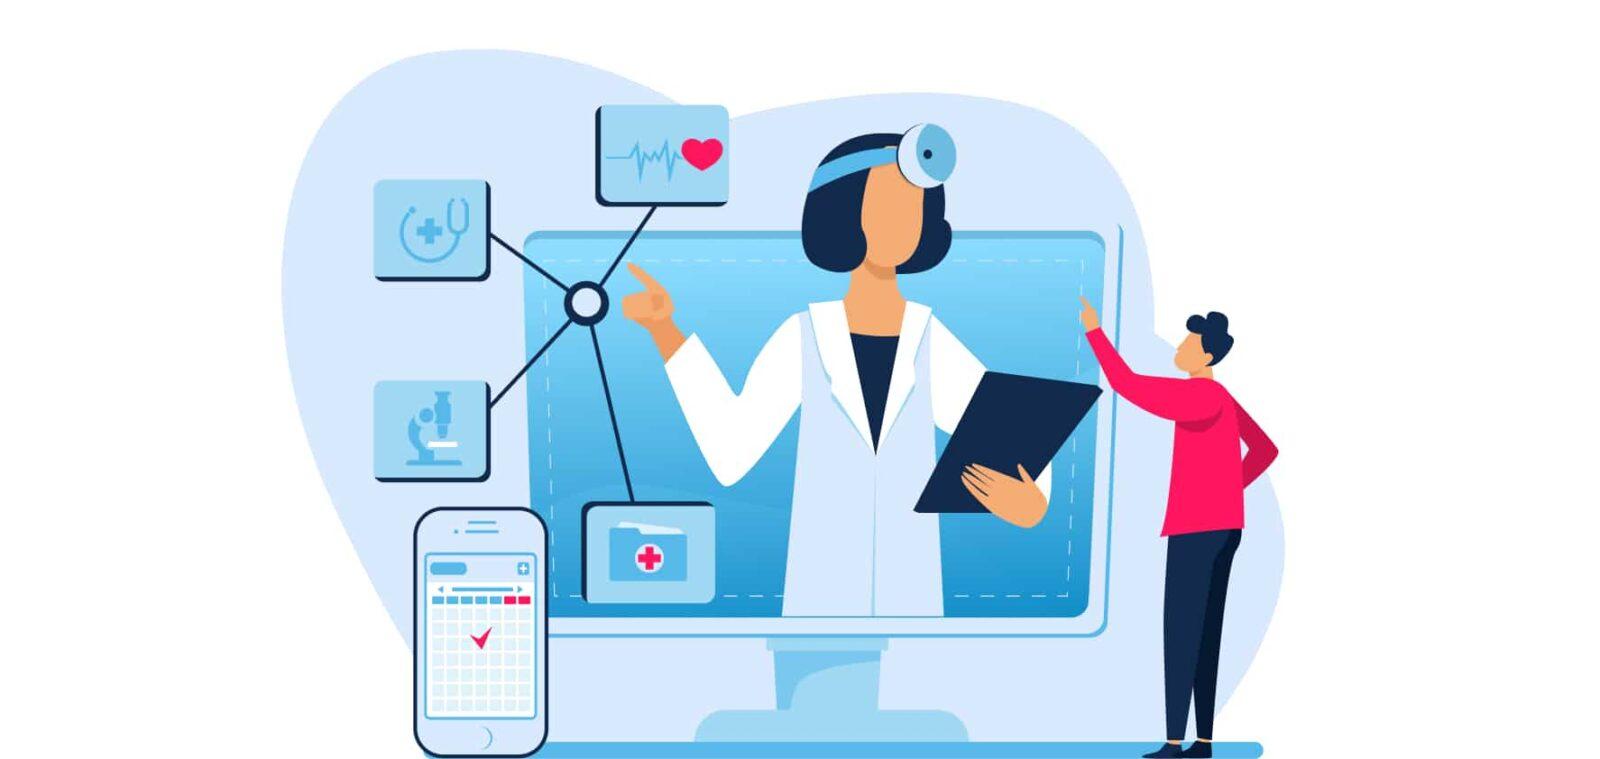 Types-of-Custom-Healthcare-Solutions illustration